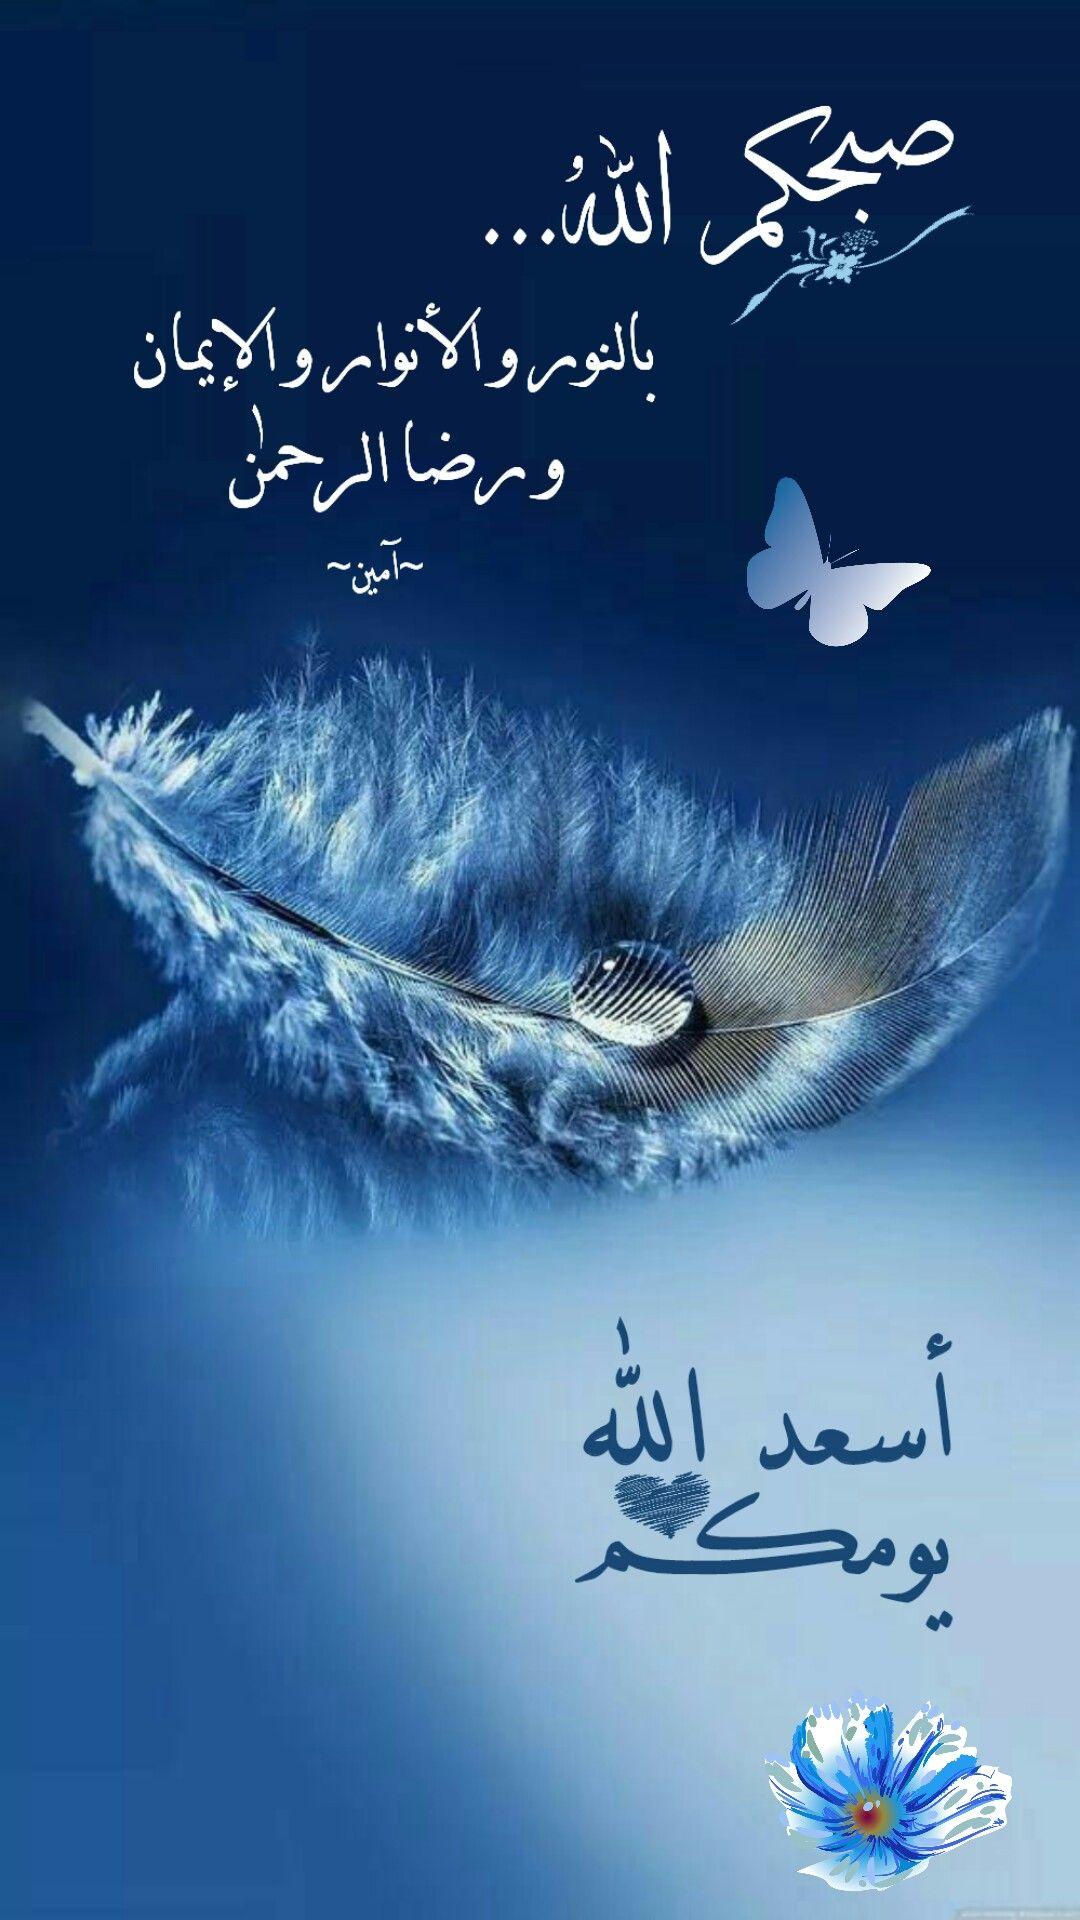 Pin By Ranya Anis On صباحيات و مسائيات Good Morning Cards Beautiful Morning Messages Good Morning Greetings